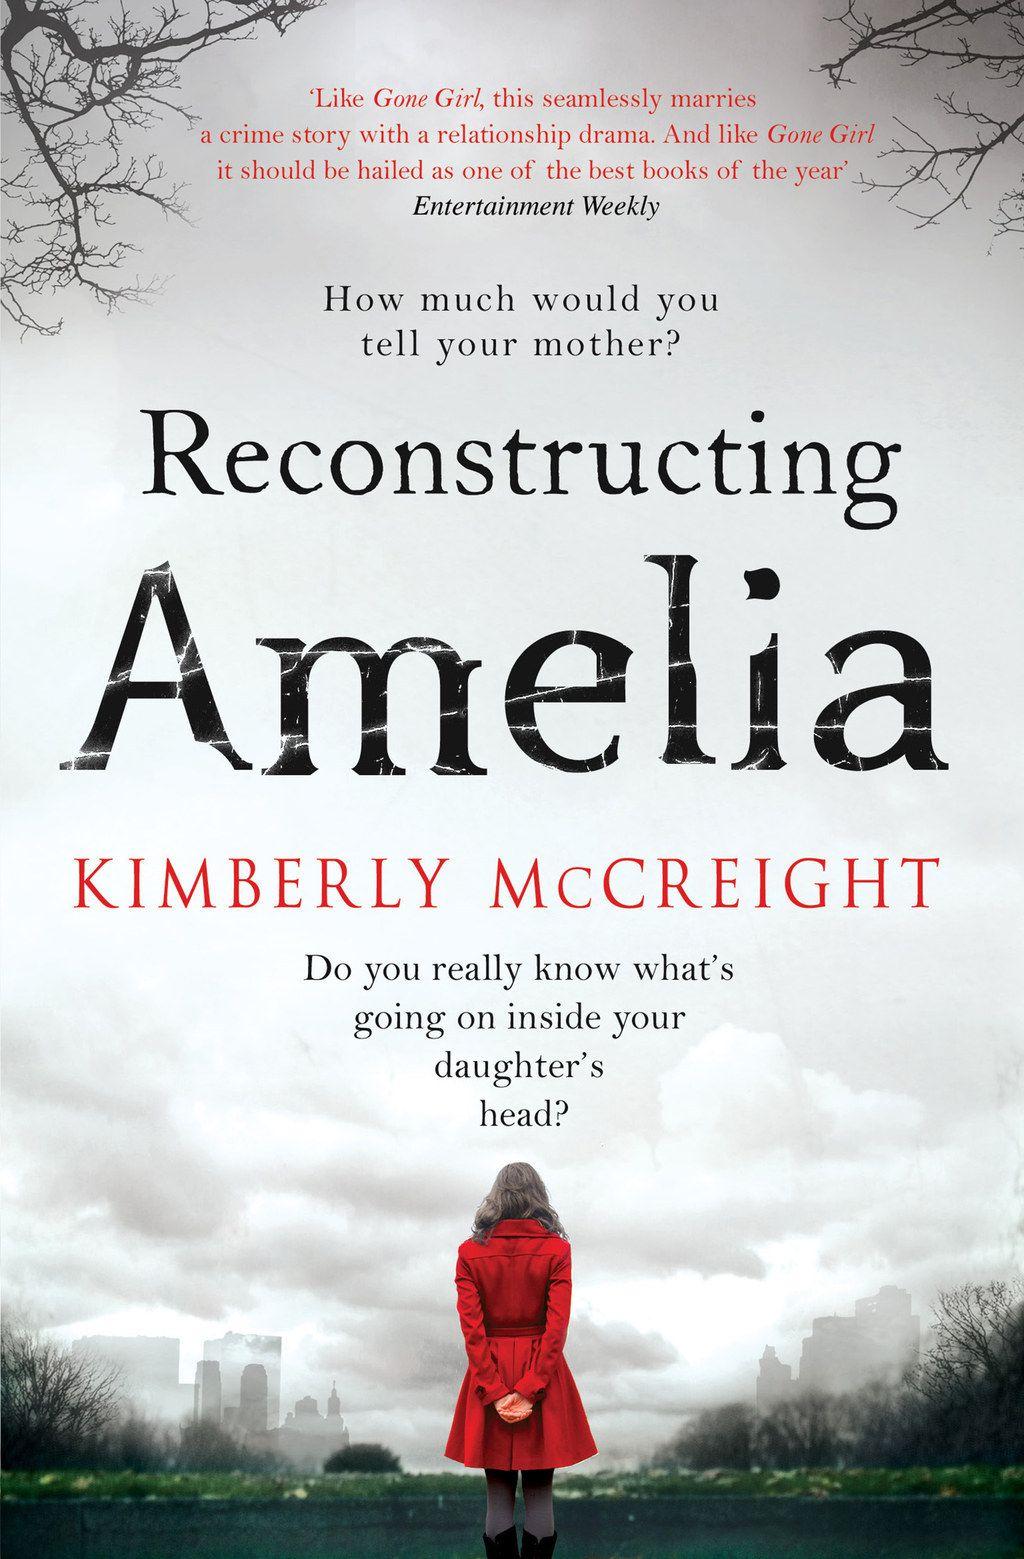 "<i><a href=""http://www.amazon.com/Reconstructing-Amelia-Novel-Kimberly-McCreight/dp/0062225448"" target=""_blank"">Reconstructing Amelia</a></i> by Kimberly McCreight"